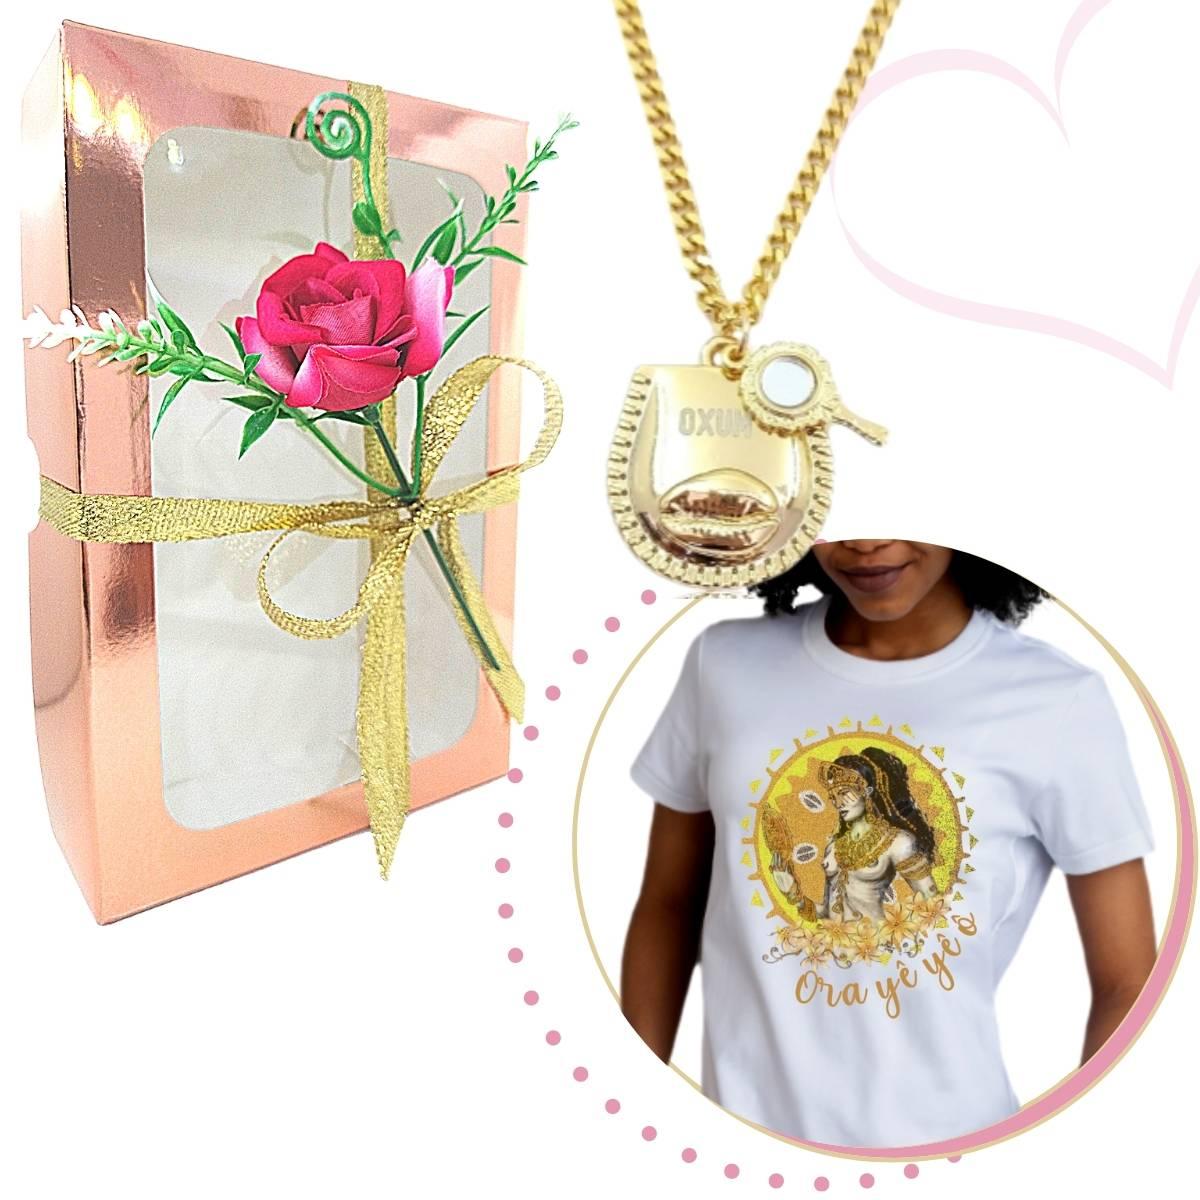 Kit de Oxum - Colar Patuá e Camiseta